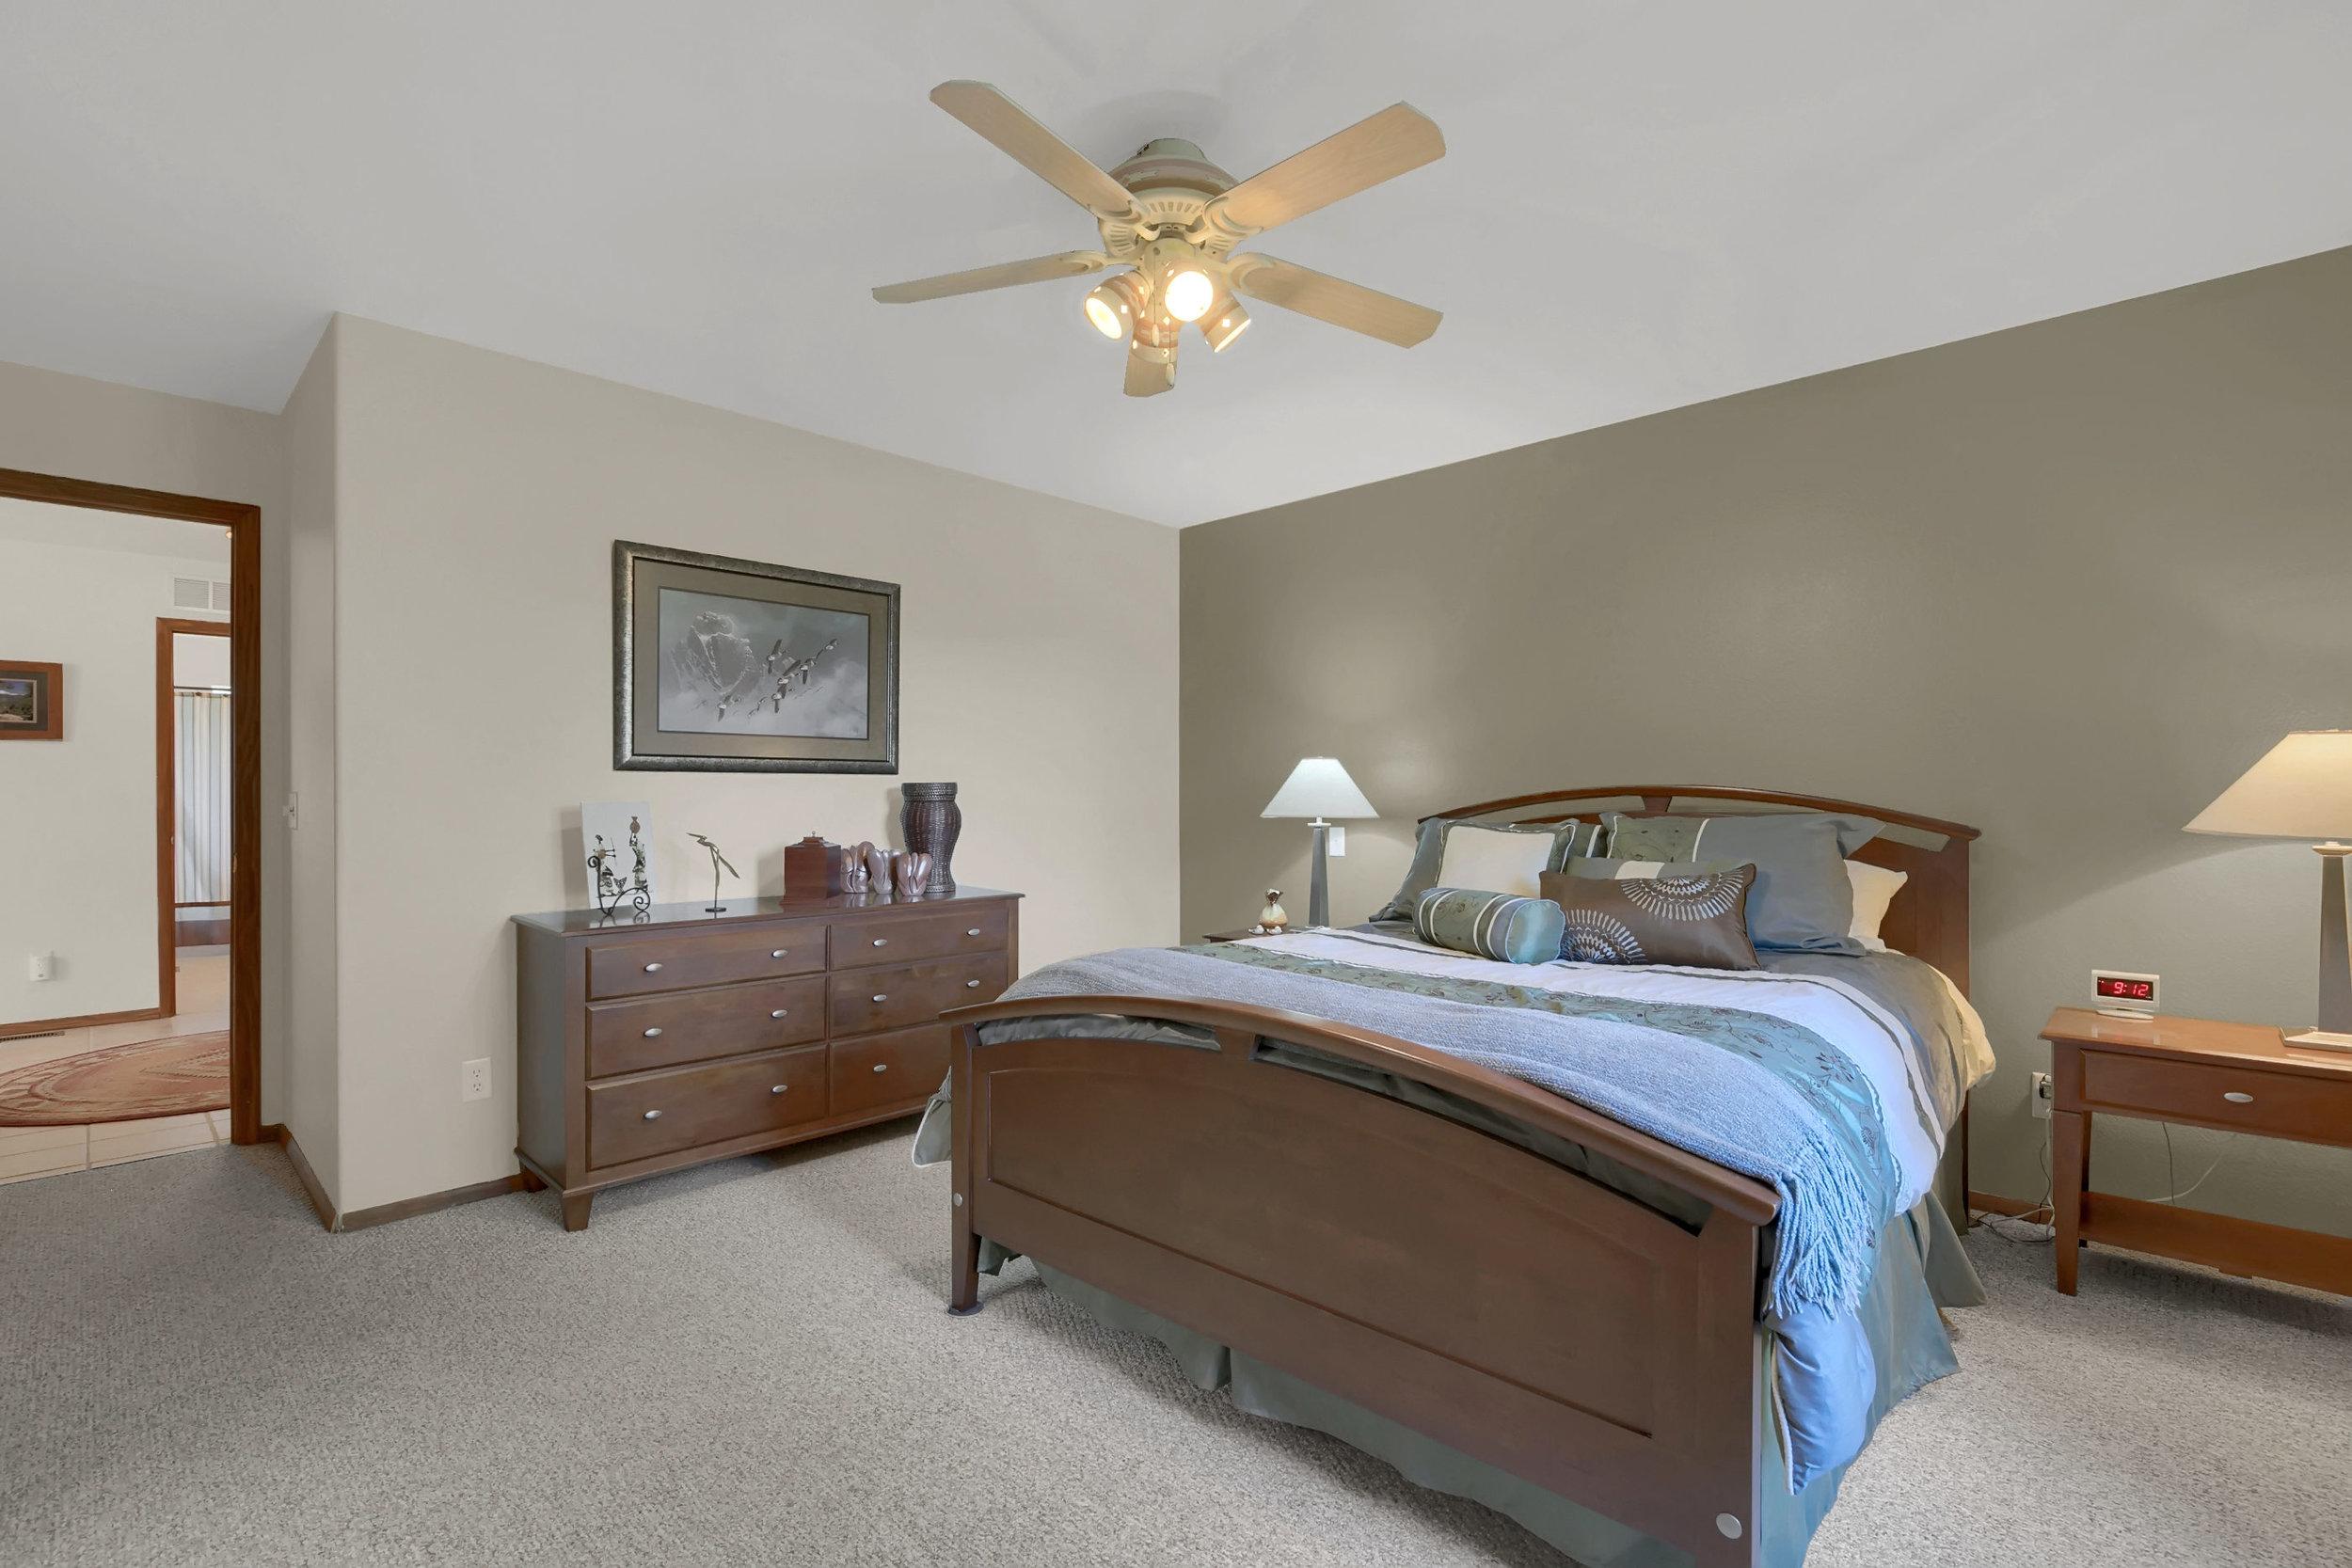 1605 Vickers Drive Colorado-print-019-001-Bedroom-2800x1867-300dpi.jpg